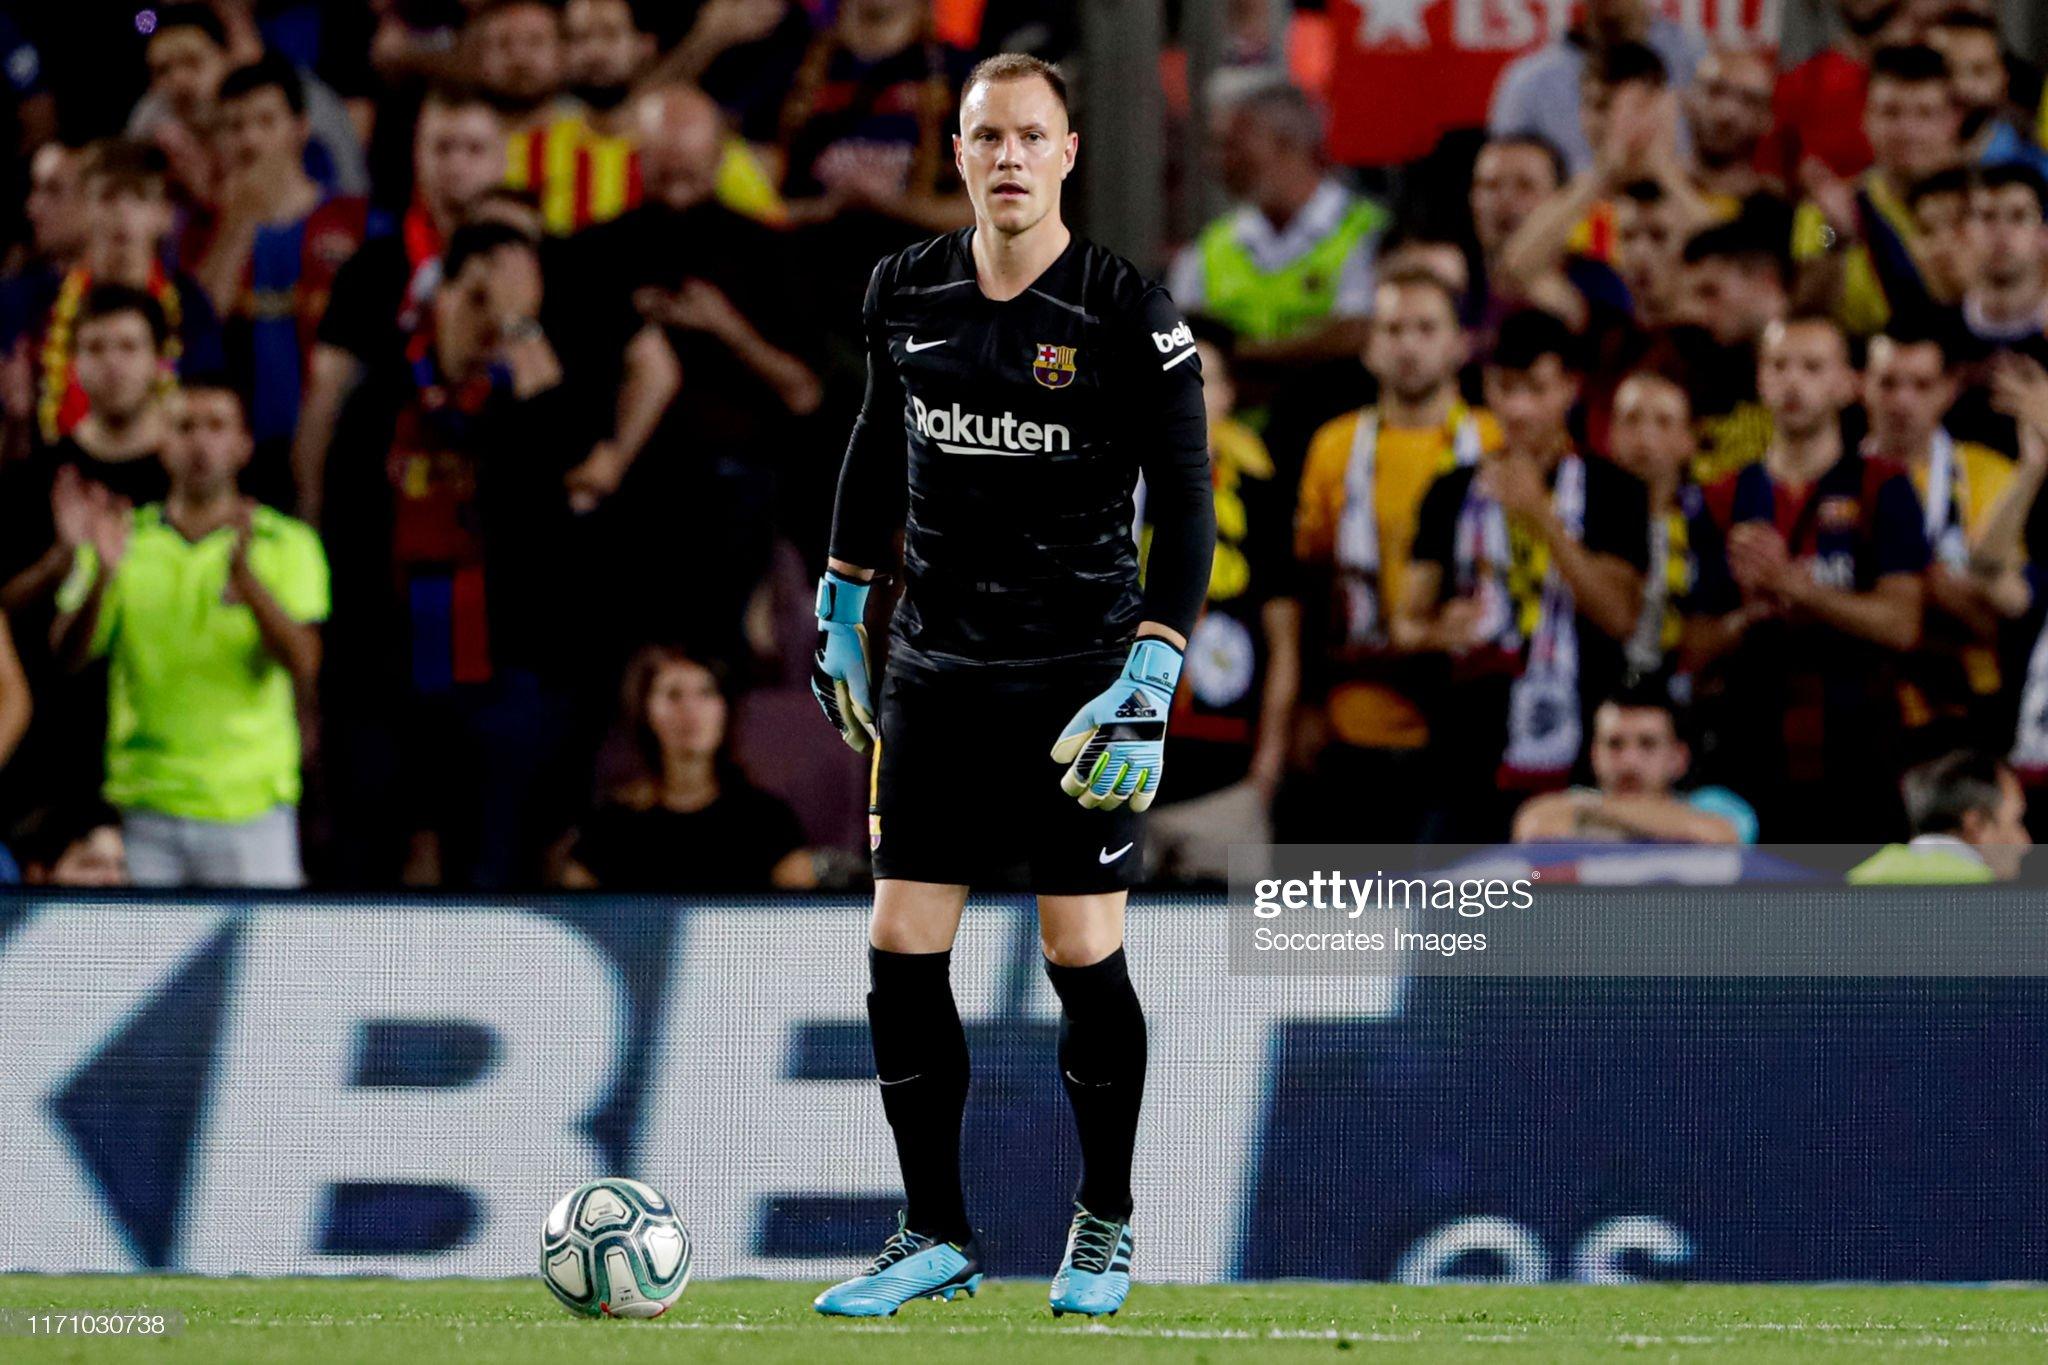 صور مباراة : برشلونة - فياريال 2-1 ( 24-09-2019 )  Marc-andre-ter-stegen-of-fc-barcelona-during-the-la-liga-santander-picture-id1171030738?s=2048x2048